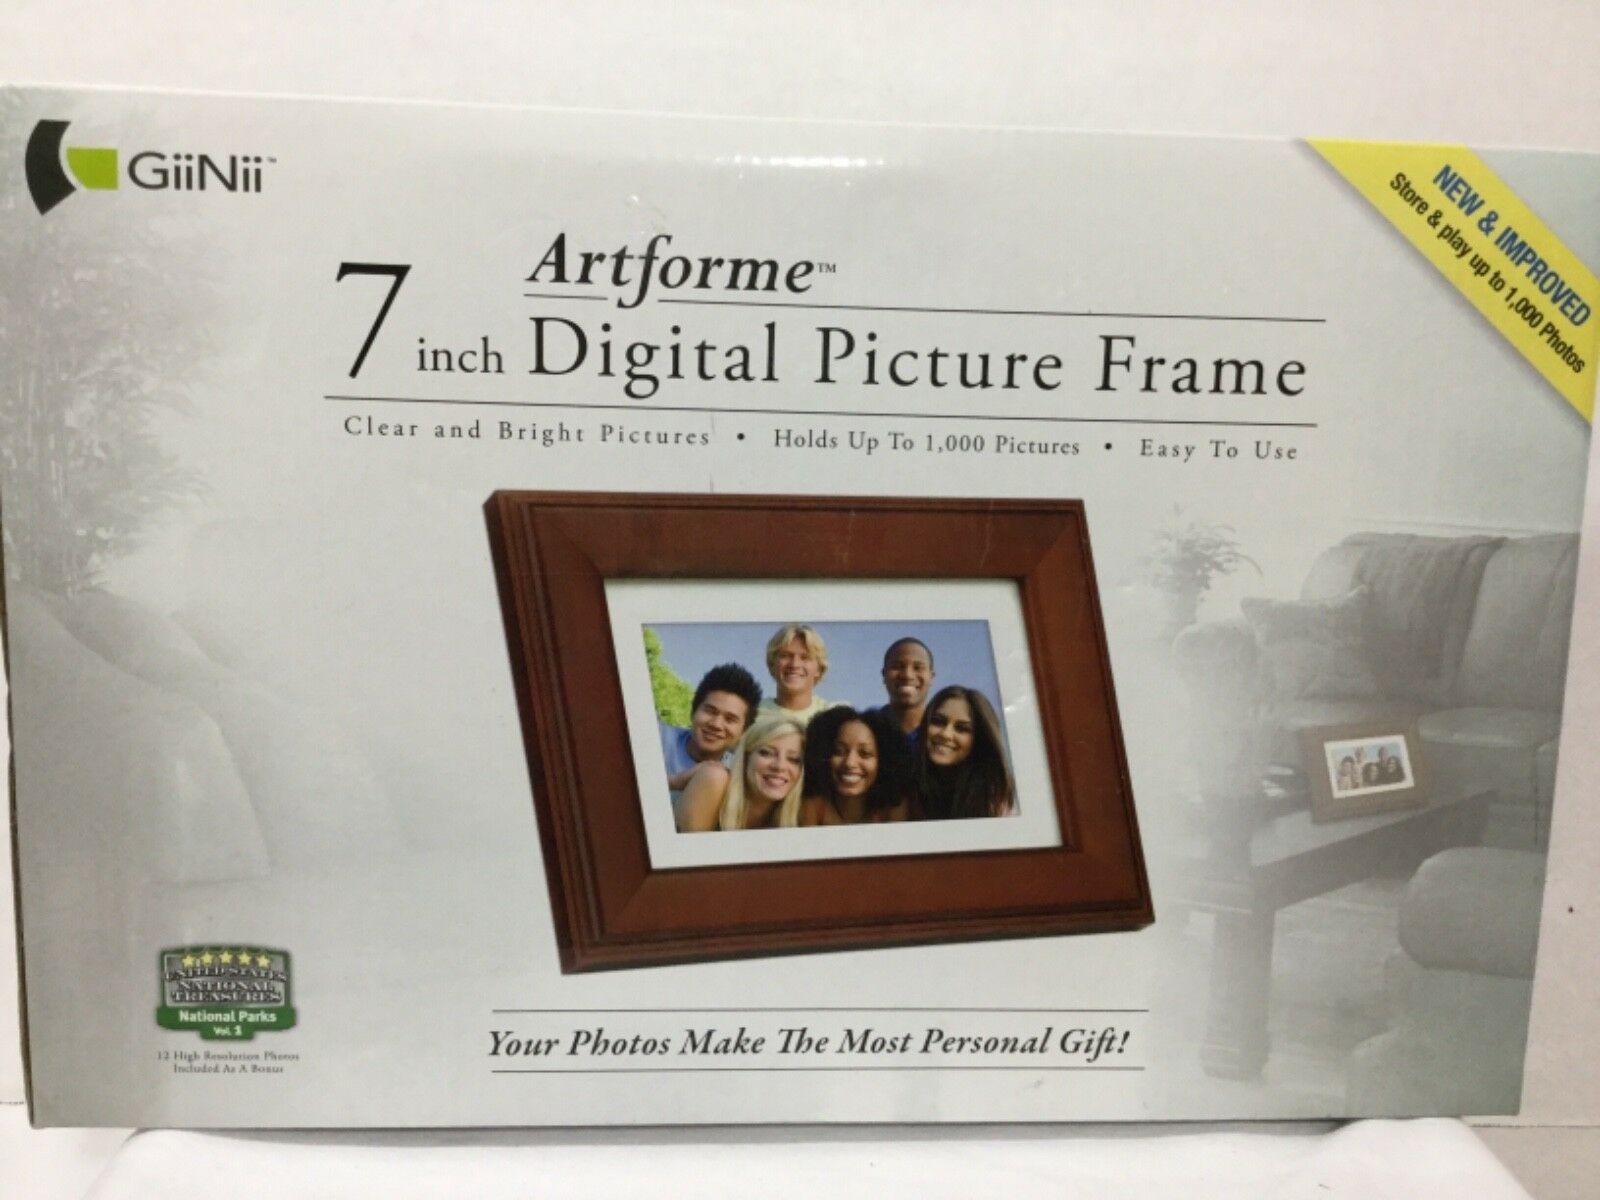 Giinii Artforme 7 Inch Digital Picture Frame Ebay